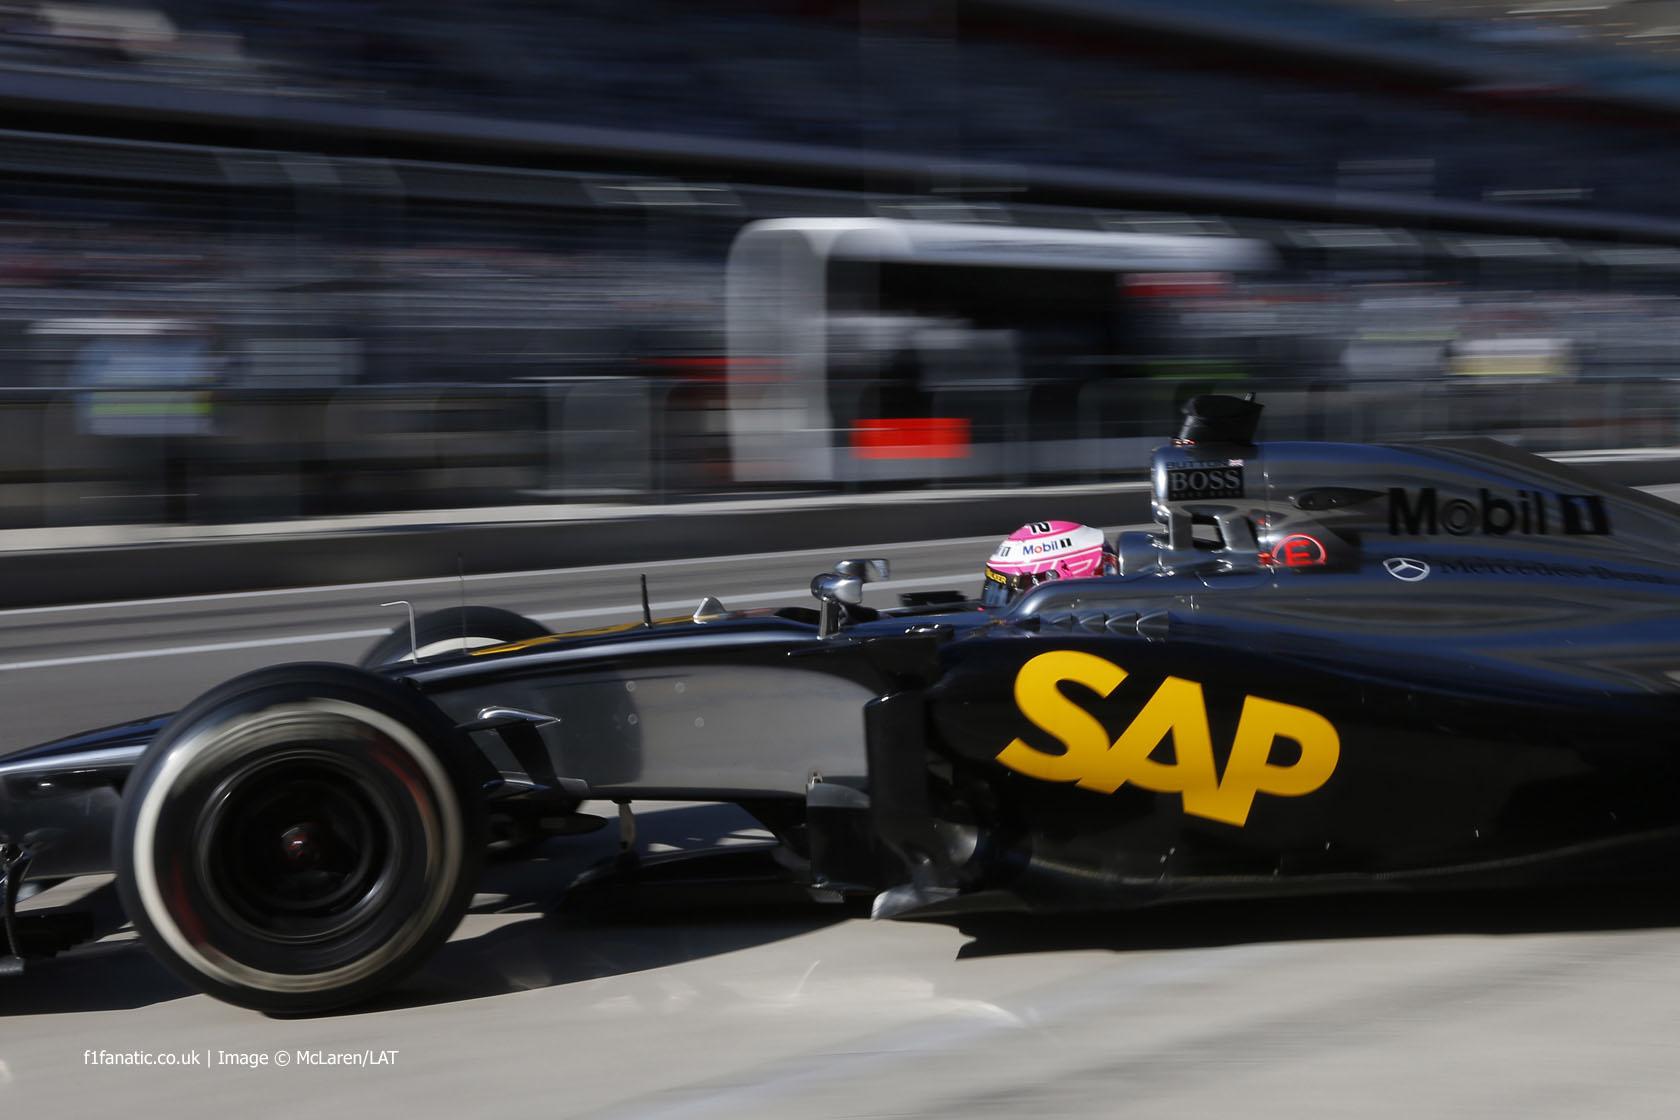 Jenson Button, McLaren, Circuit of the Americas, 2014